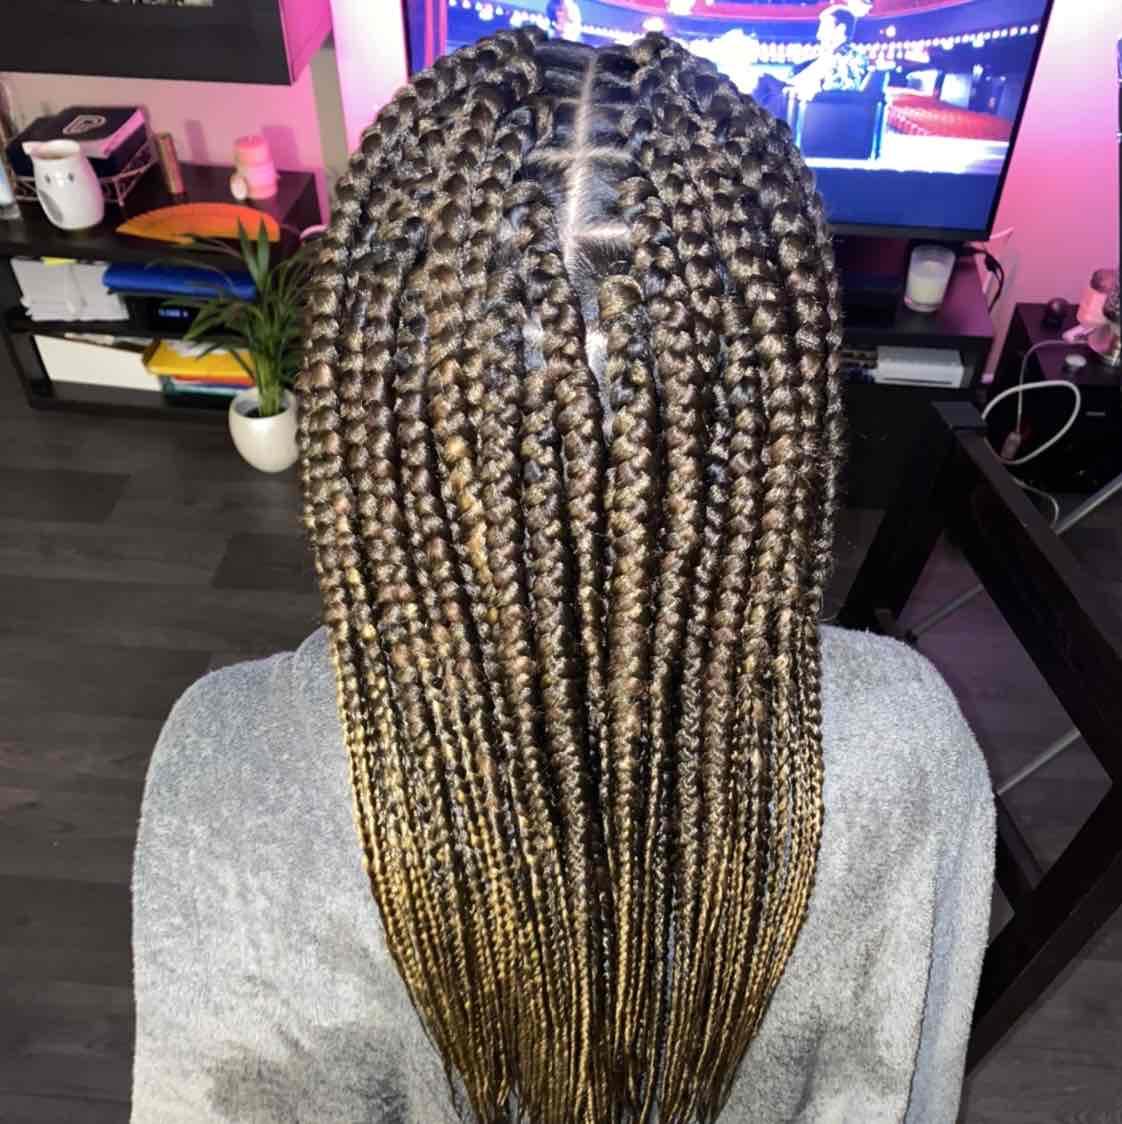 salon de coiffure afro tresse tresses box braids crochet braids vanilles tissages paris 75 77 78 91 92 93 94 95 BFBKIUTU